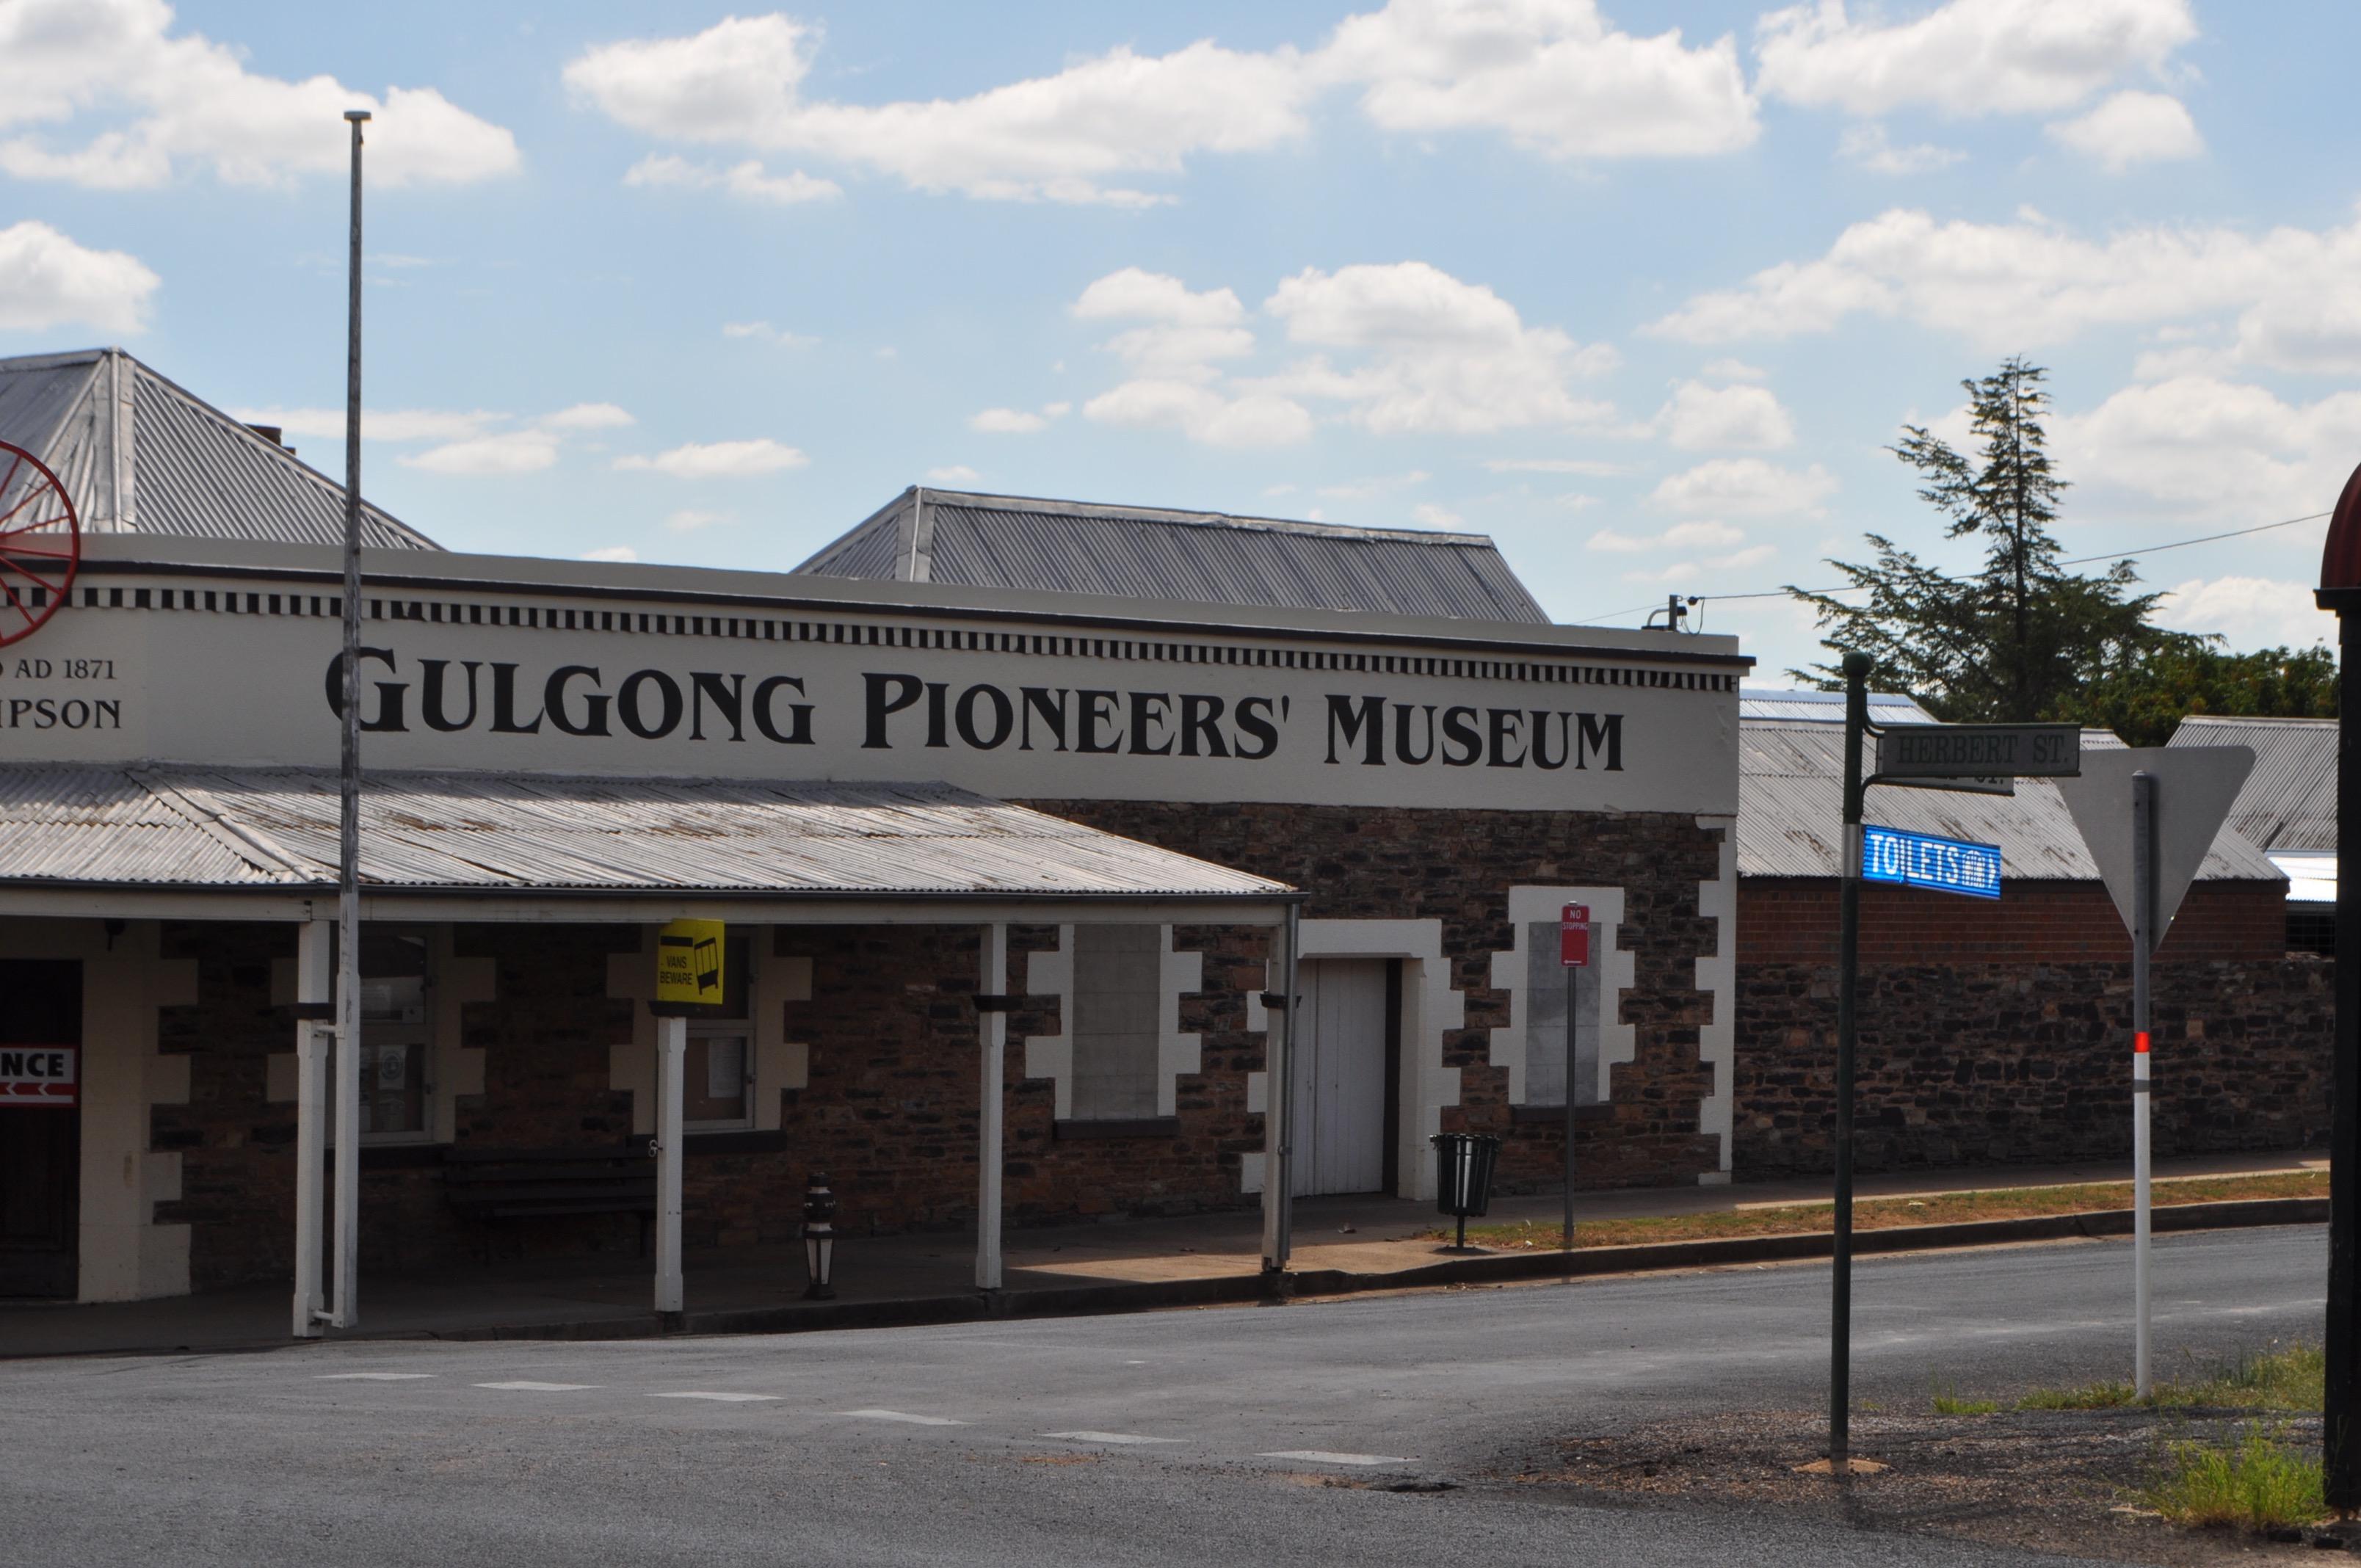 Pioneer Museum Gulgong